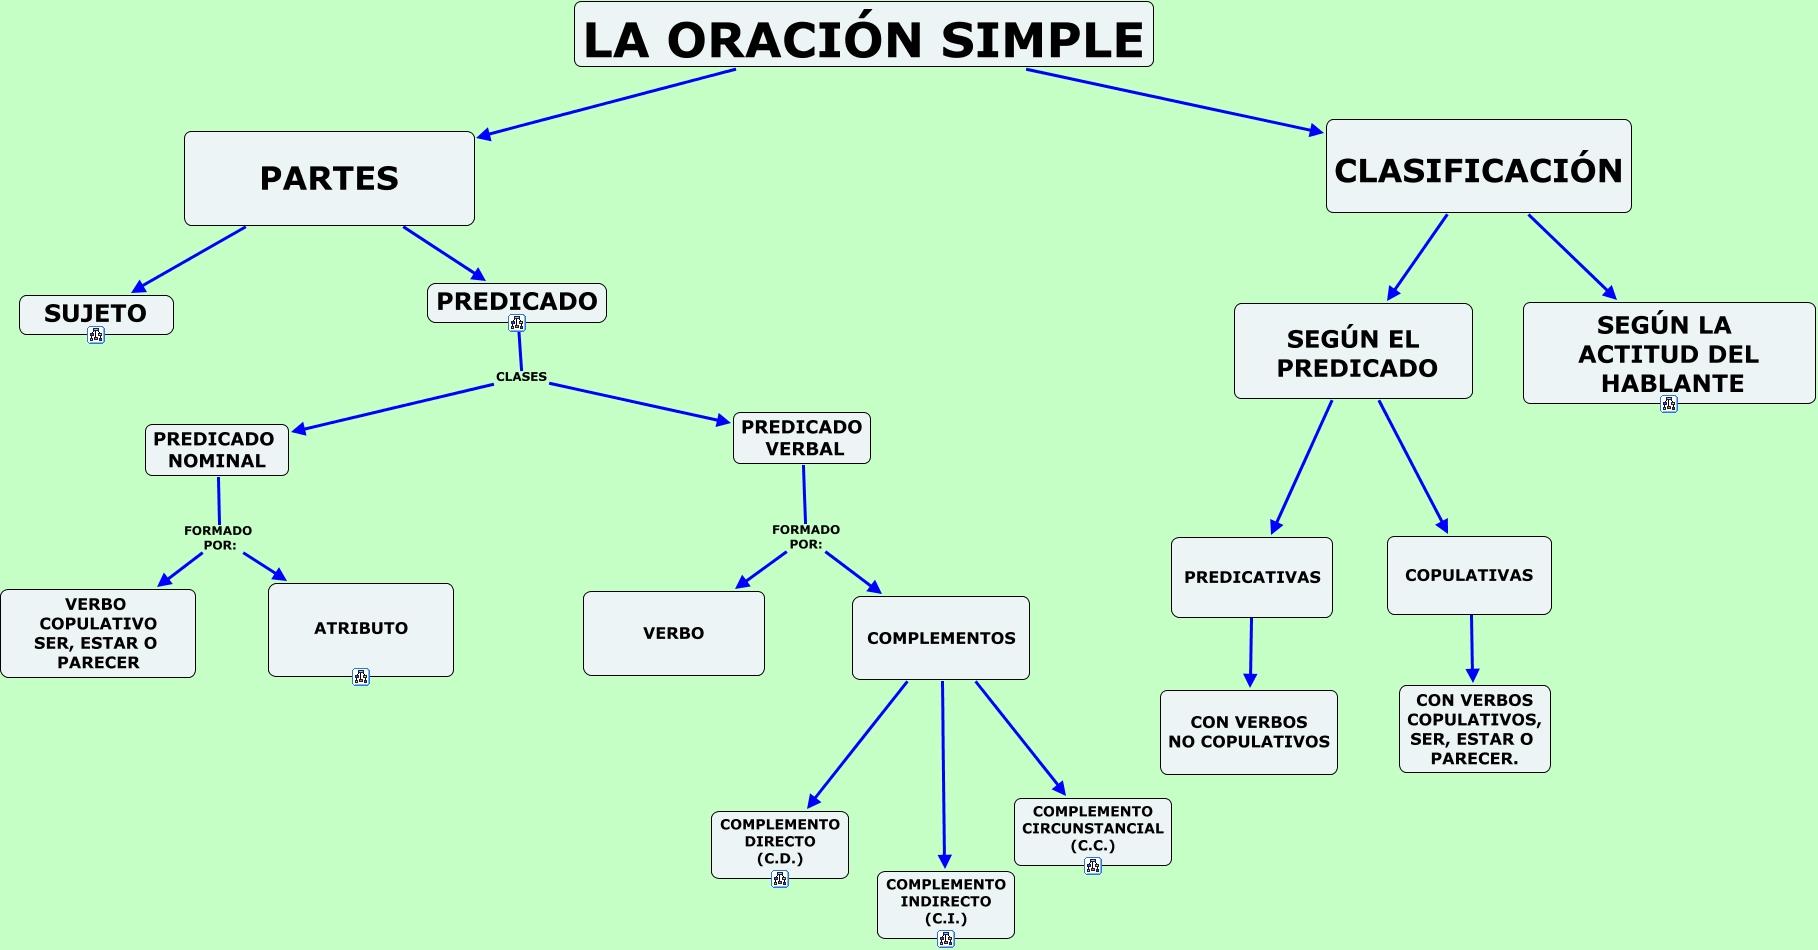 sujetola-oracic3b3n-simple